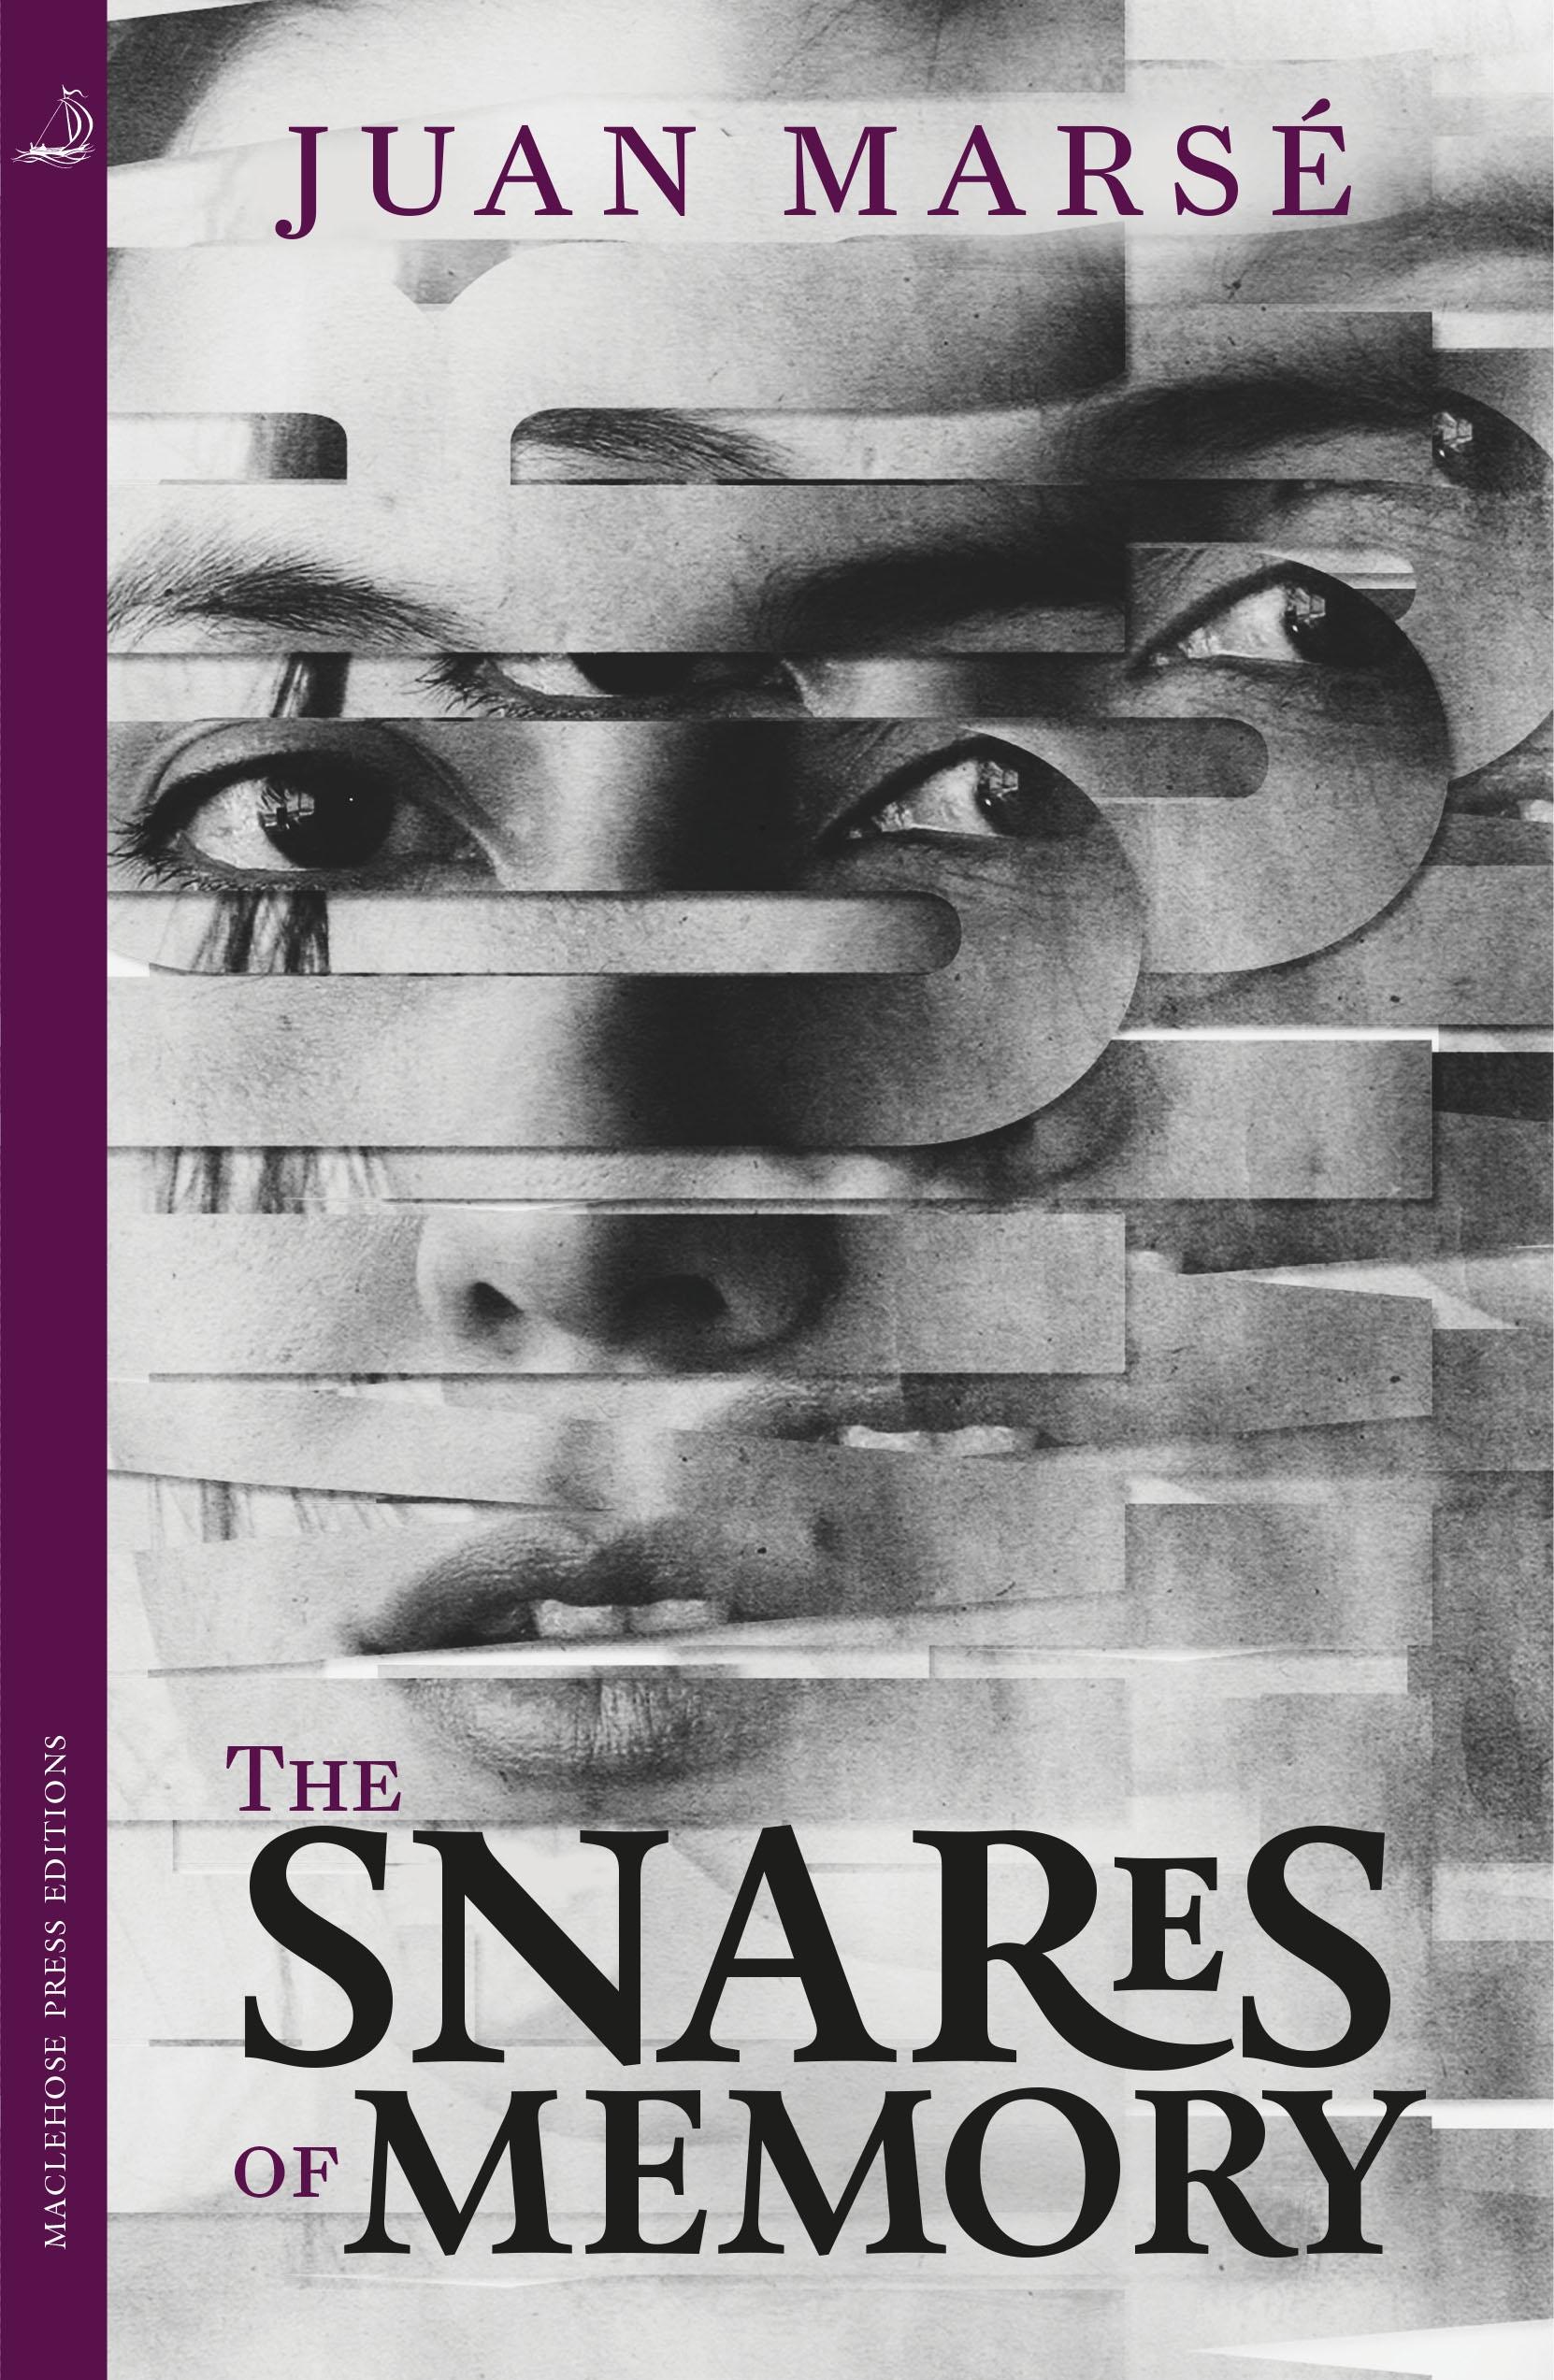 The Snares of Memory by Juan Marsé | Hachette UK